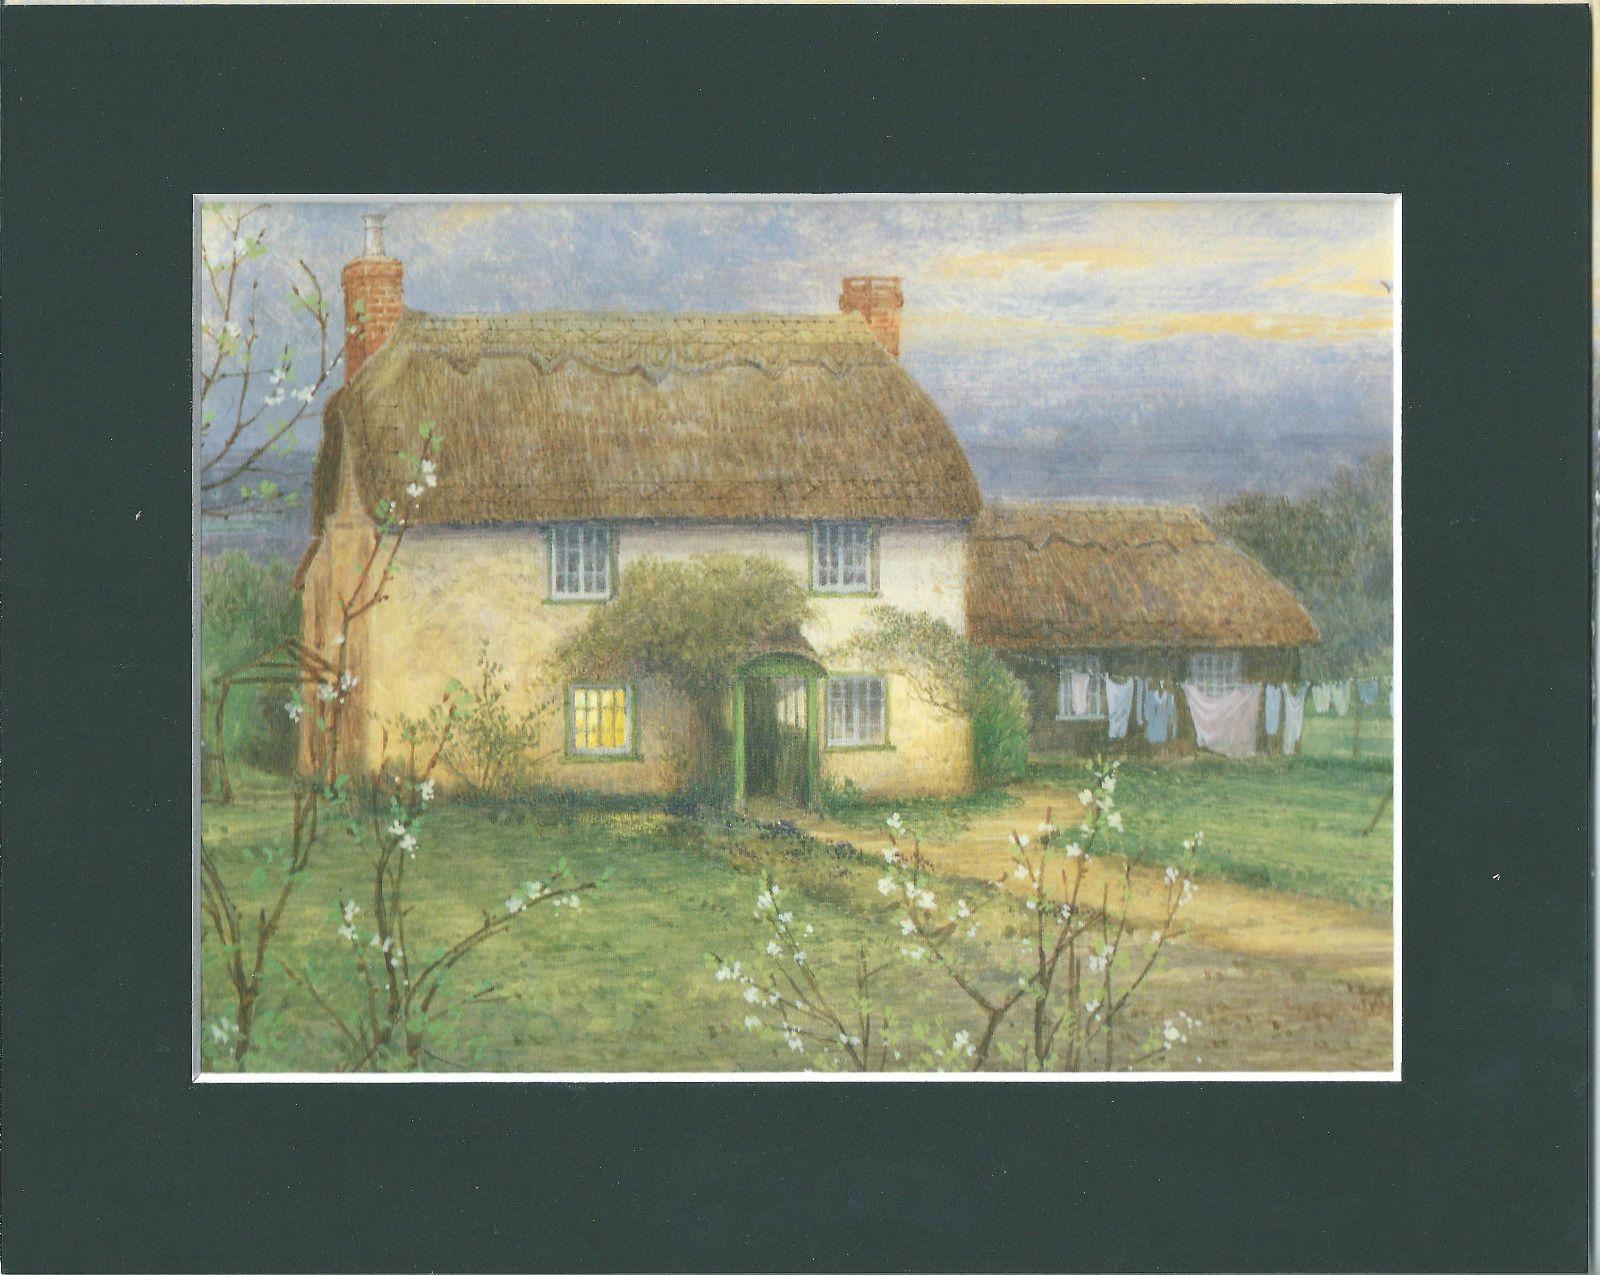 http://www.ebay.co.uk/itm/Gordon-BENINGFIELD-Village-Print-in-Mount-COTTAGE-AT-BRAMSHAW-/371214697885